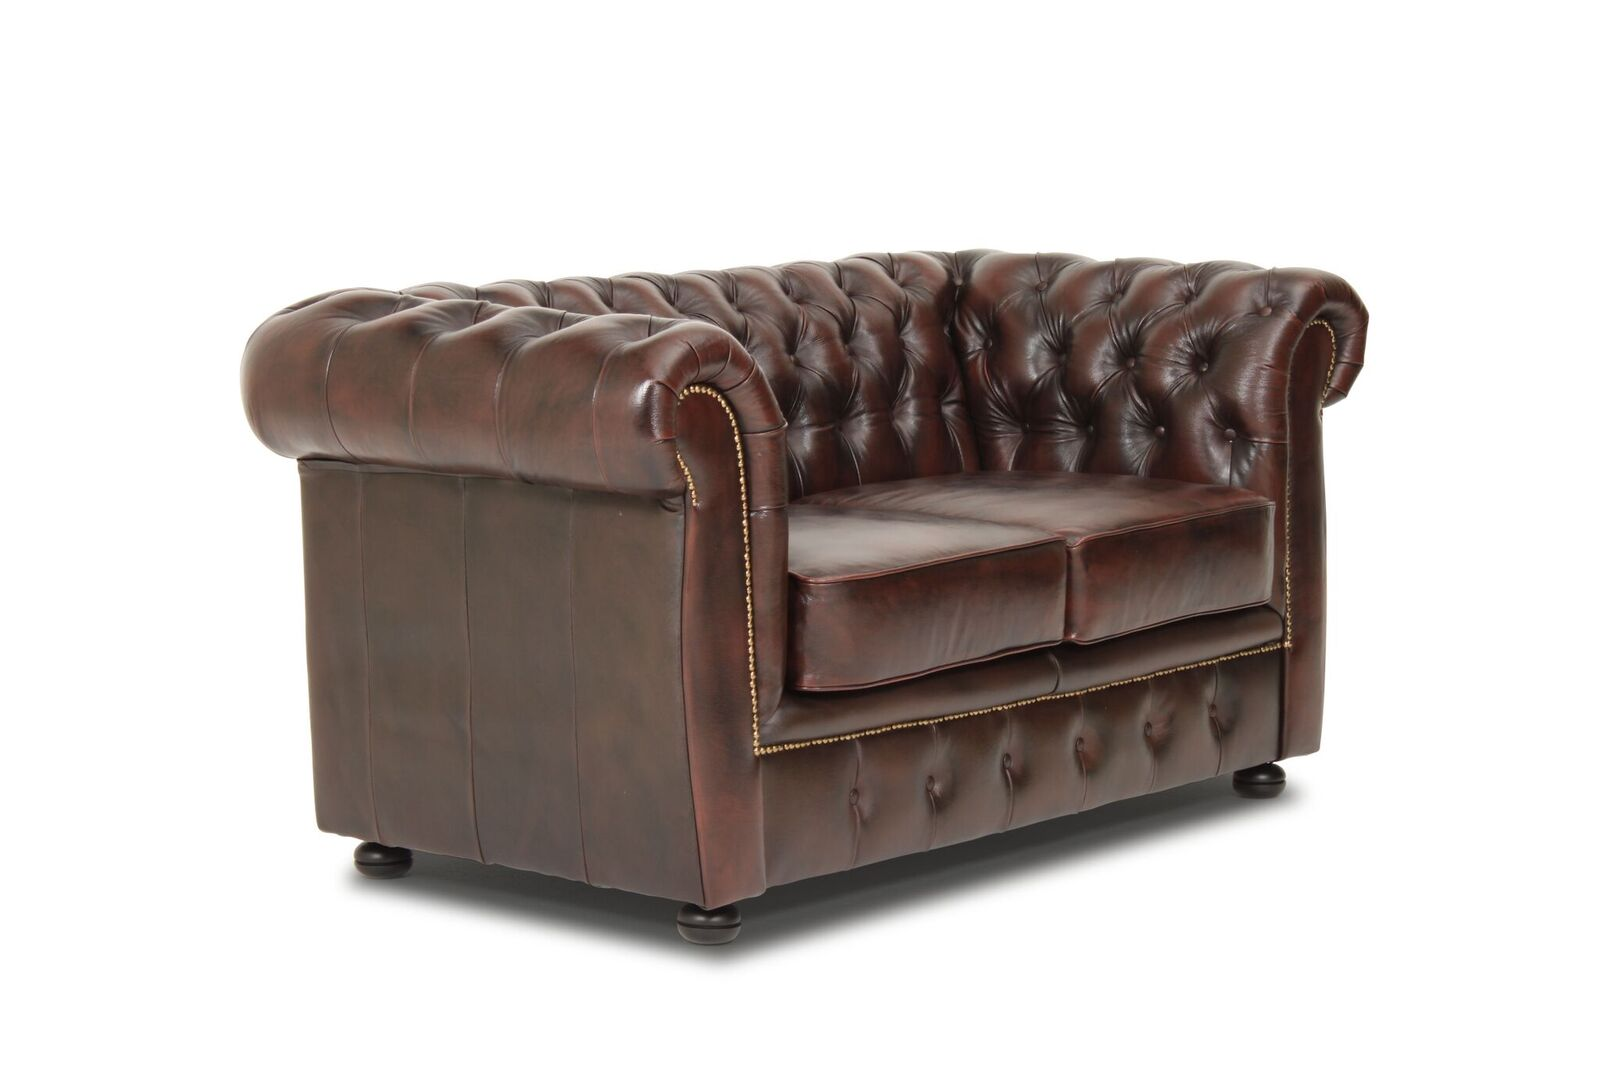 Haga liverpool 2 pers. sofa - brun læder fra haga gruppen fra boboonline.dk